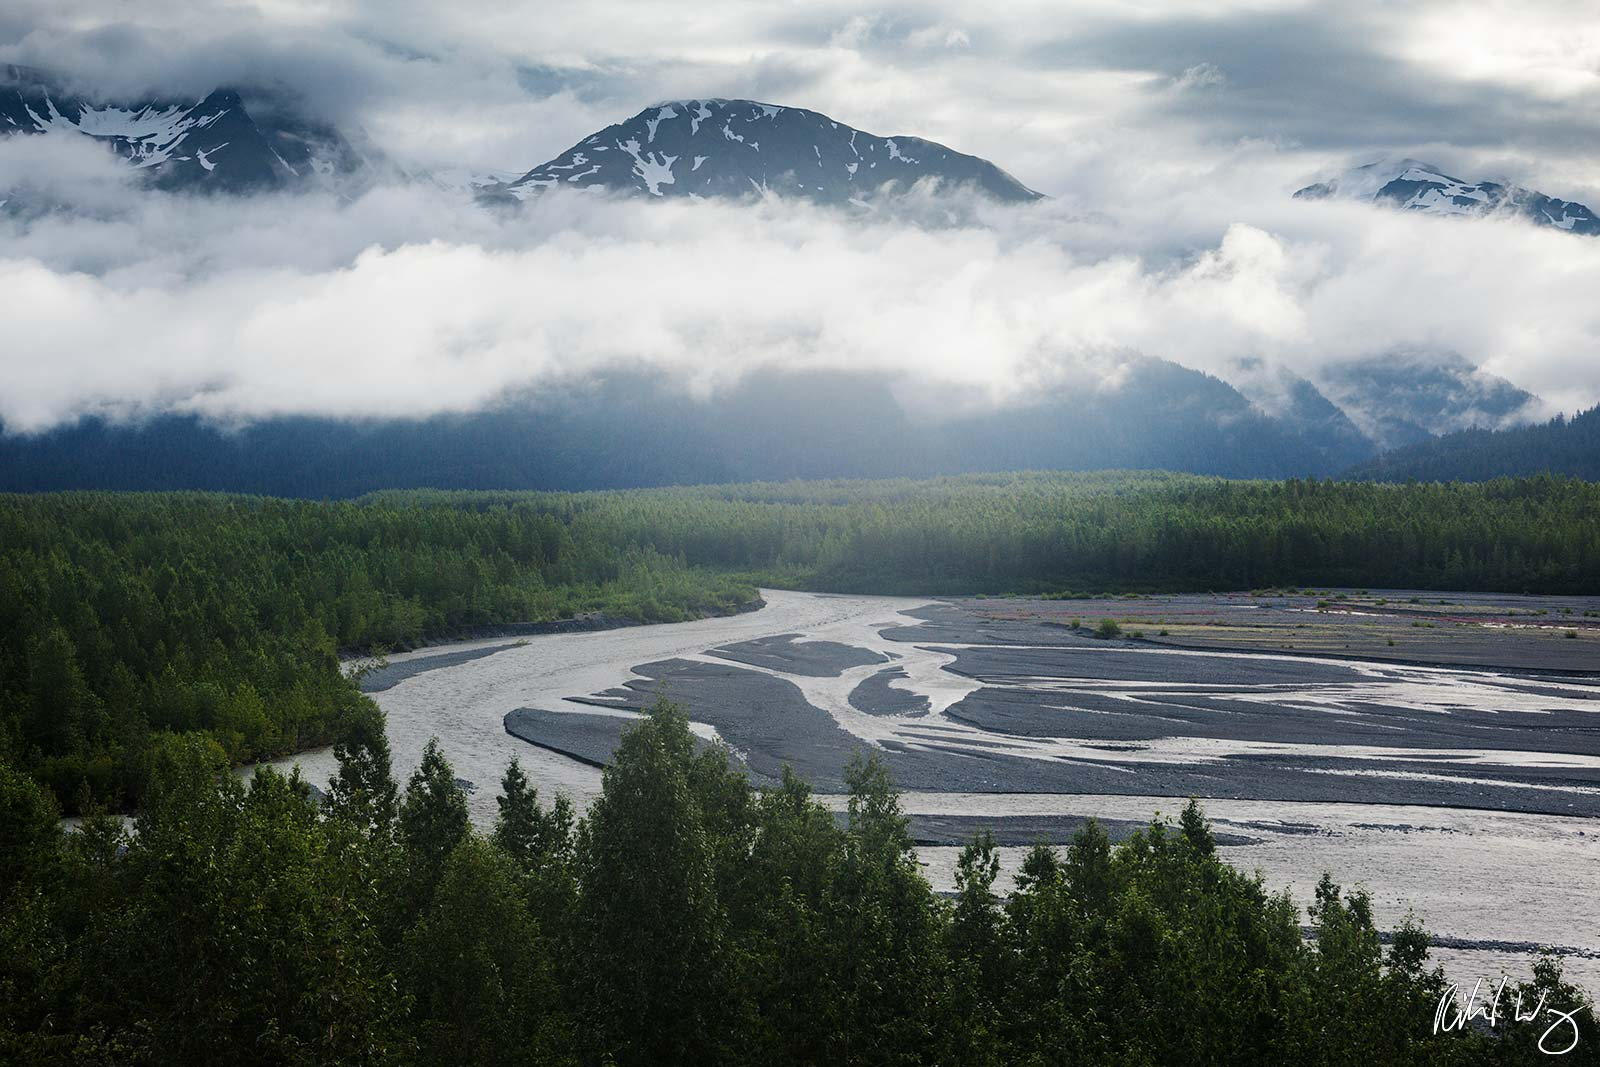 Resurrection River Scenic Vista From Exit Glacier Trail, Kenai Fjords National Park, Alaska, photo, photo